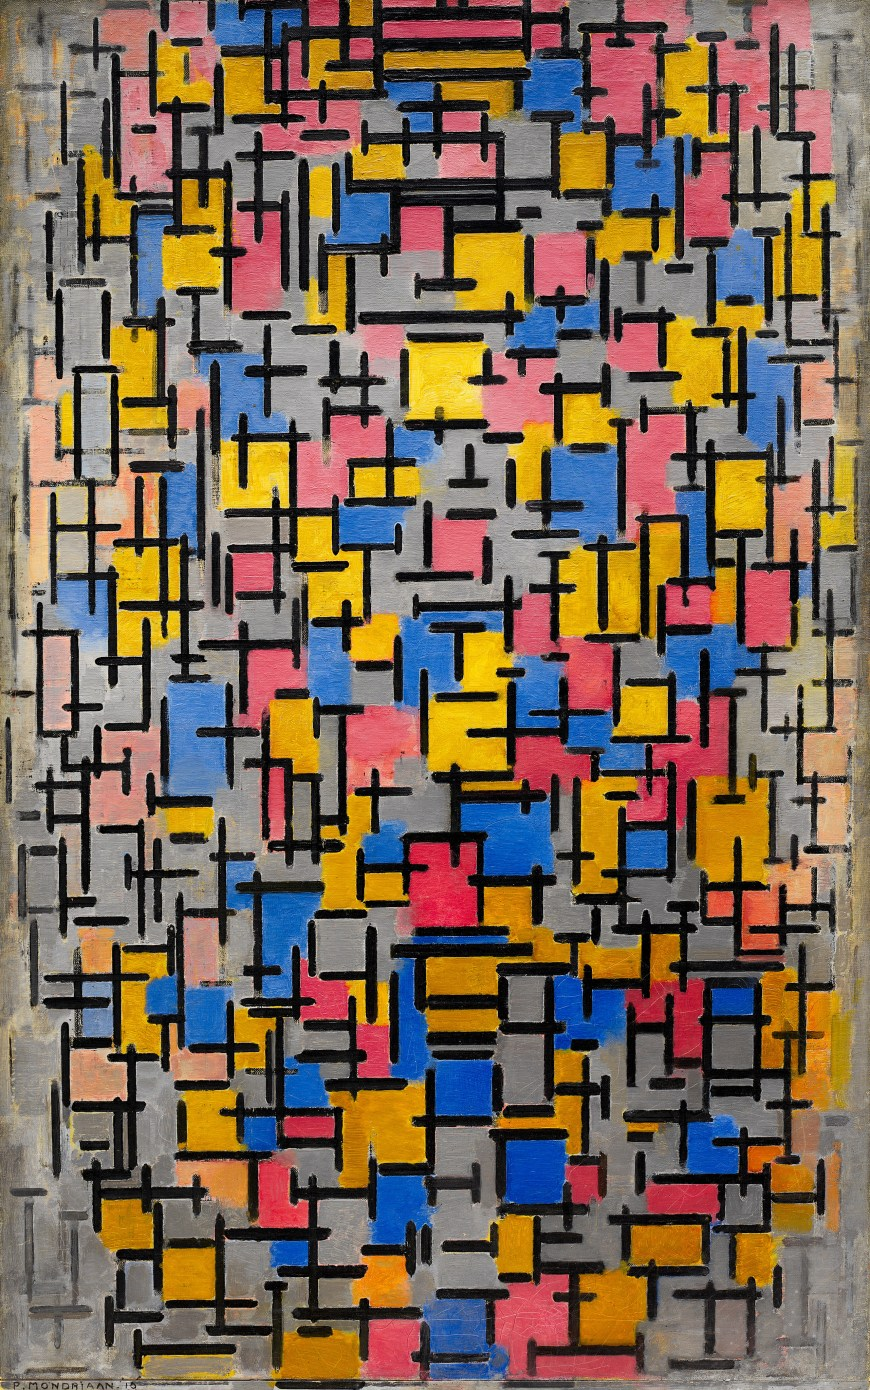 Piet Mondrian,  Composition , 1916, Guggenheim Museum, New York.